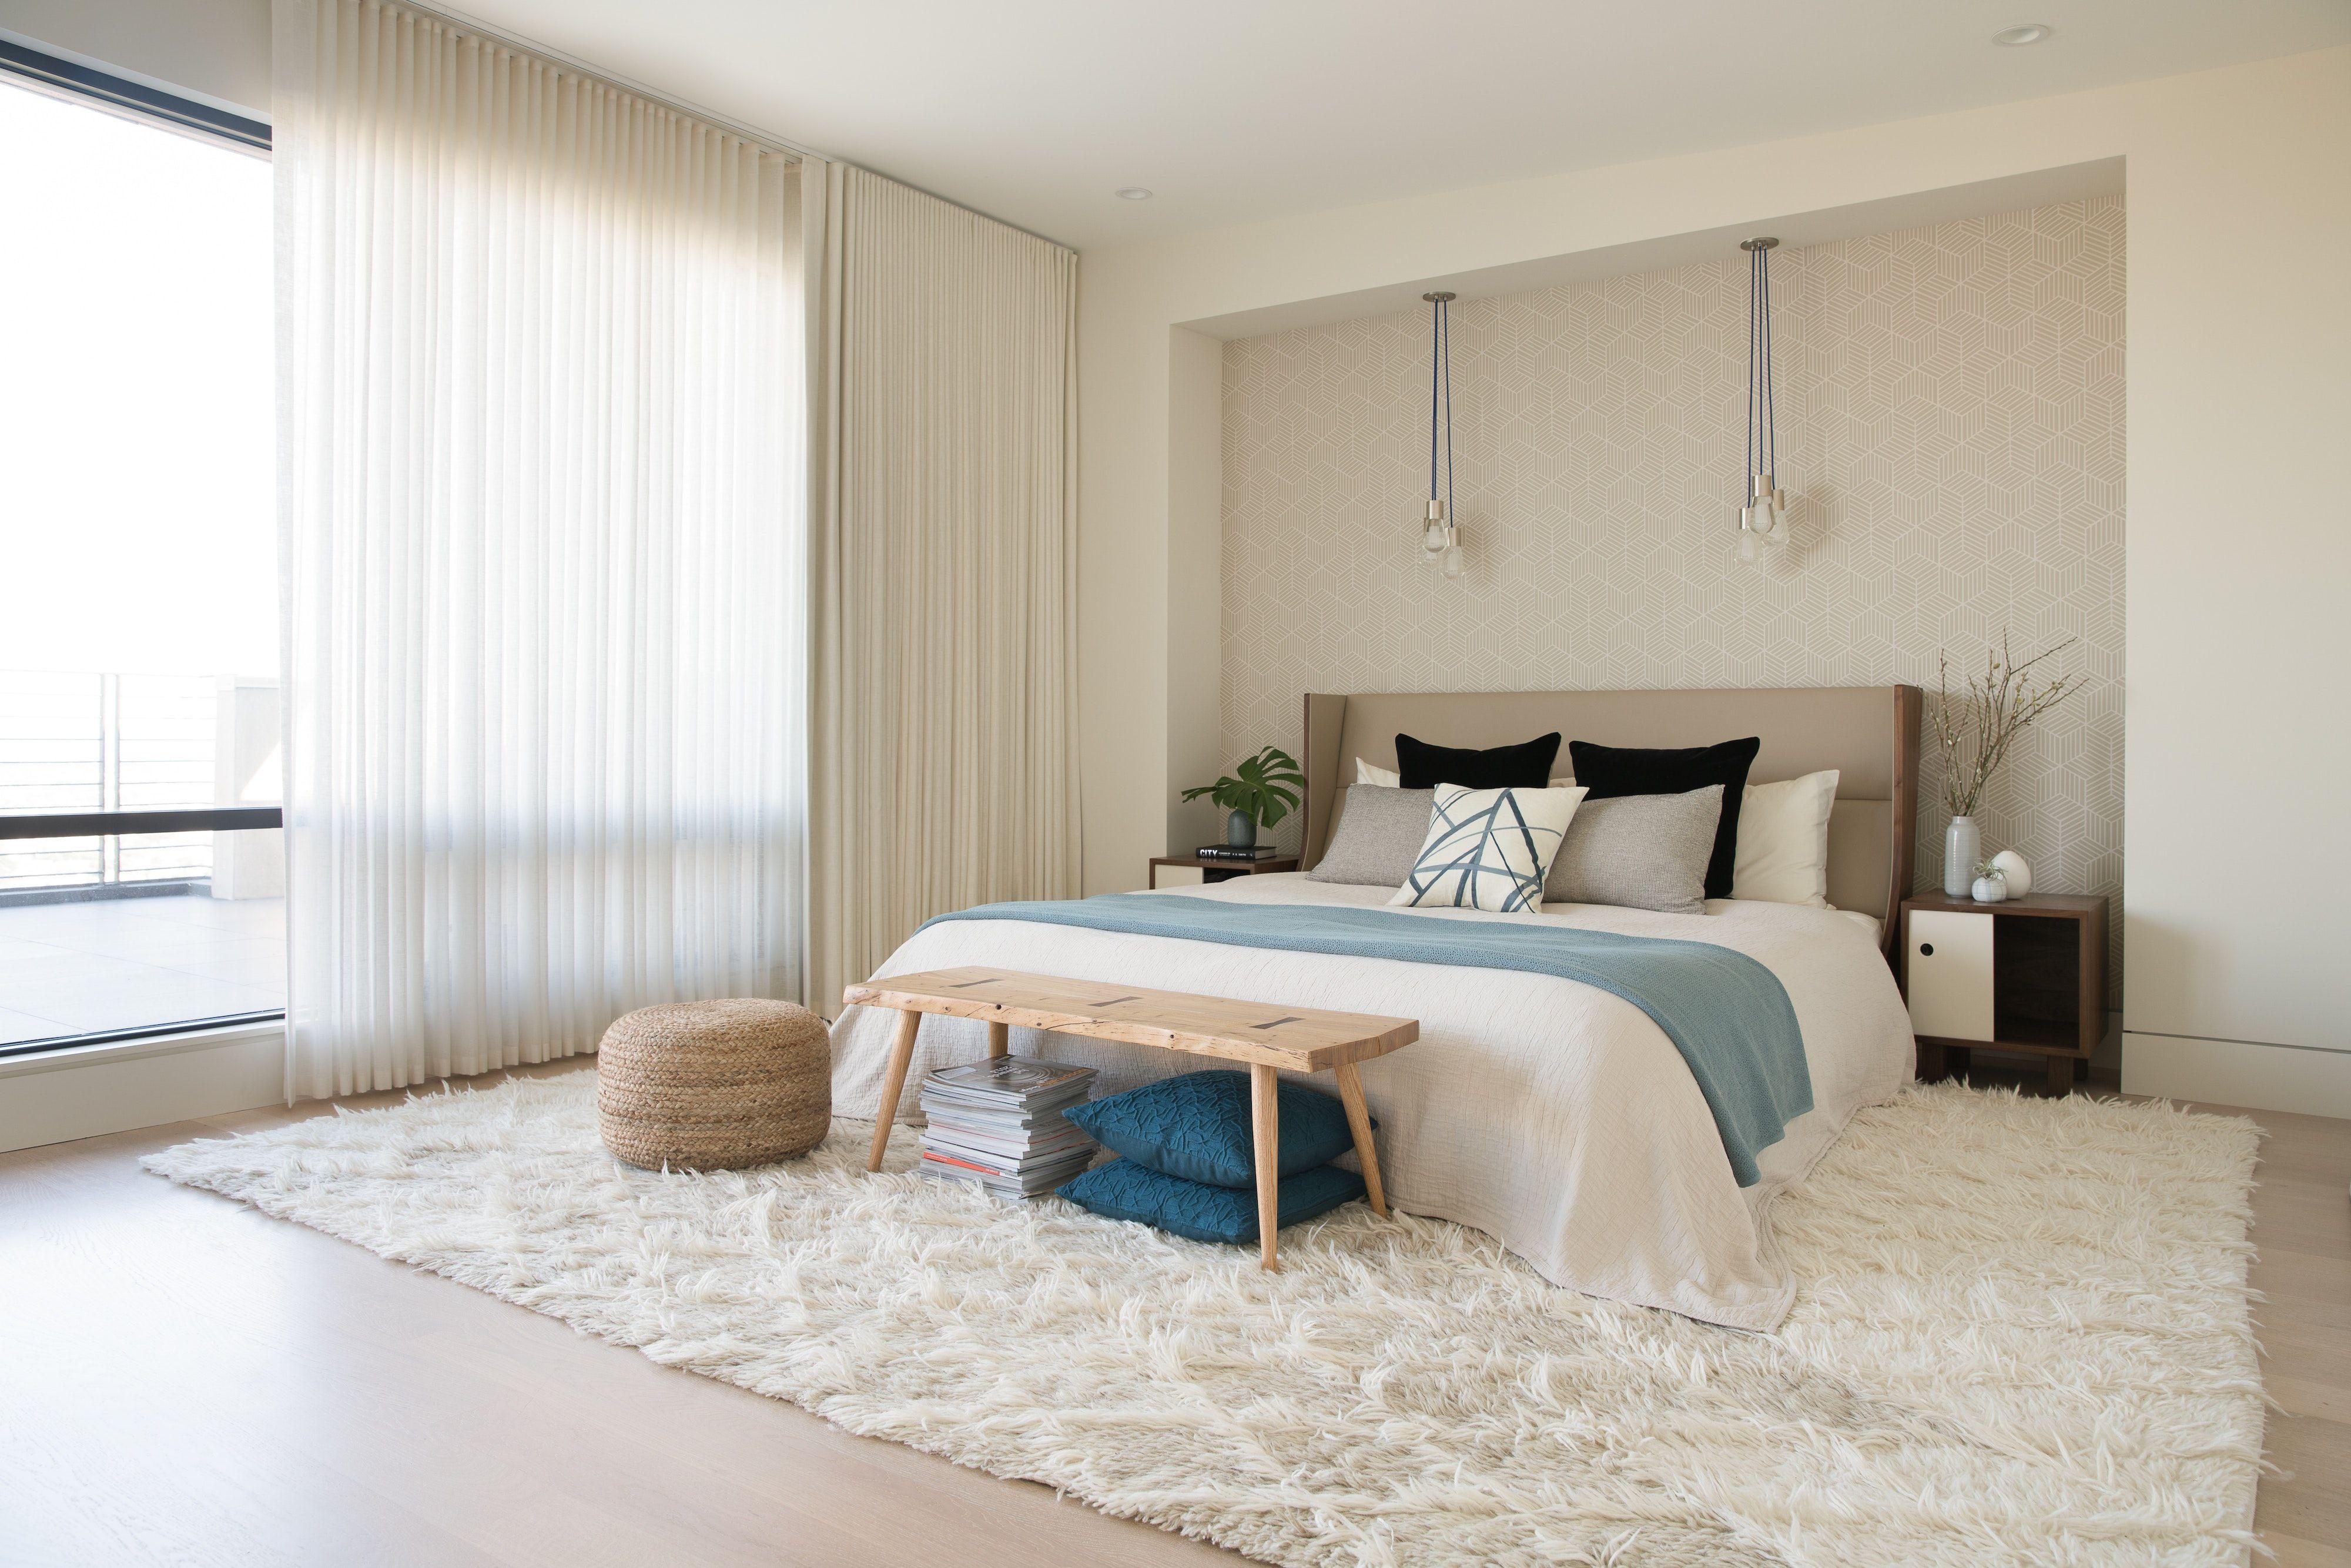 Verolinens Sleepinluxury White Master Bedroom Contemporary Room High Pile Rug